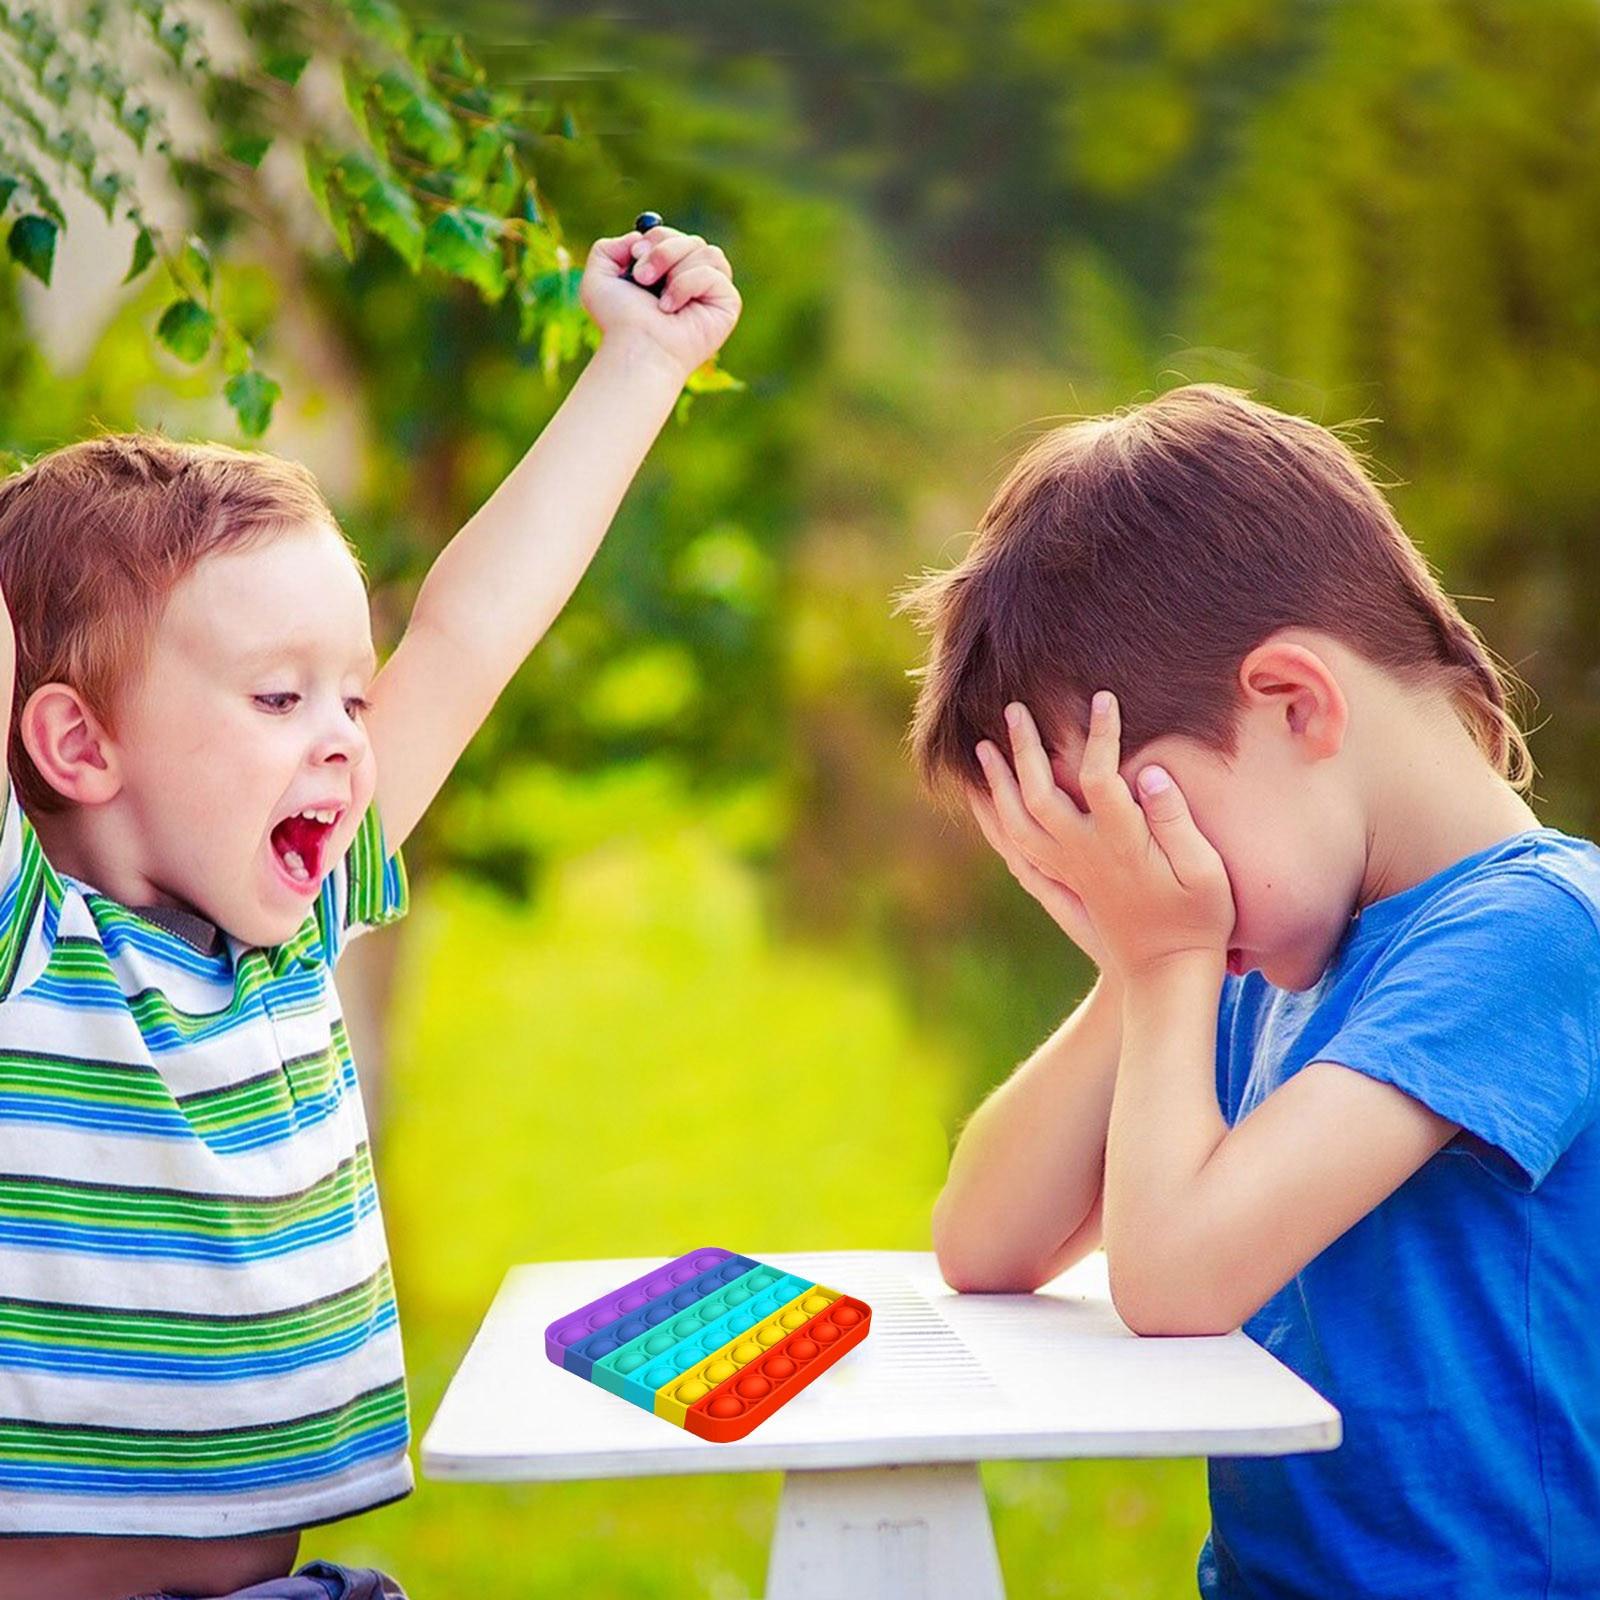 Toy Fidget-Toys Sensory-Toy Autism Needs-Stress Push Bubble Reliever Popit Special Kids img2